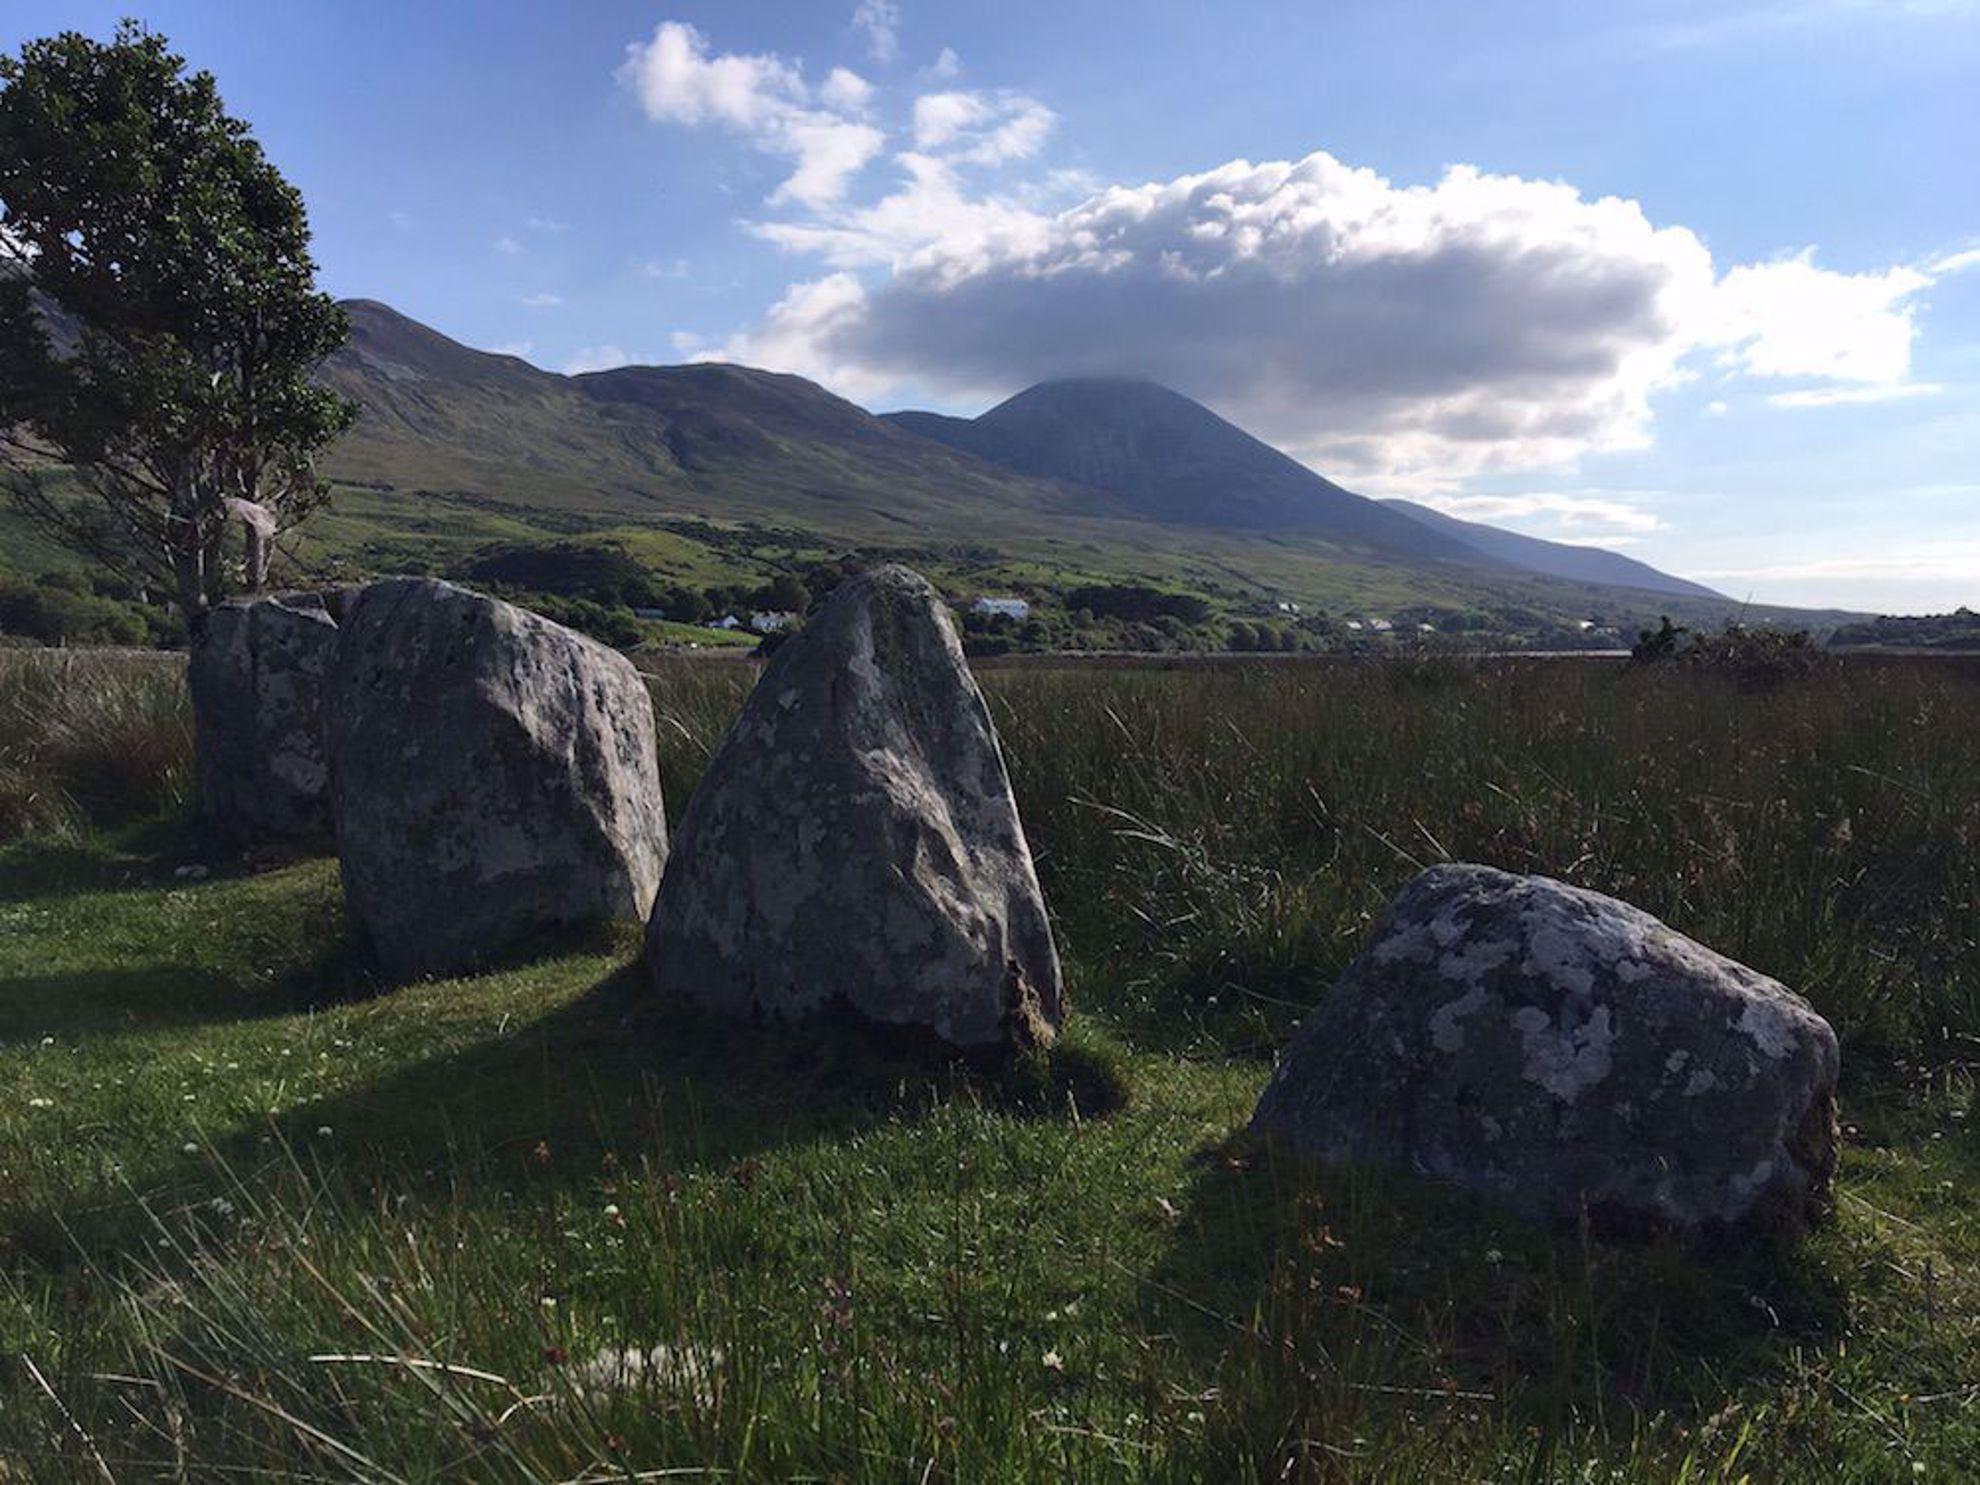 Croagh Patrick with rocks